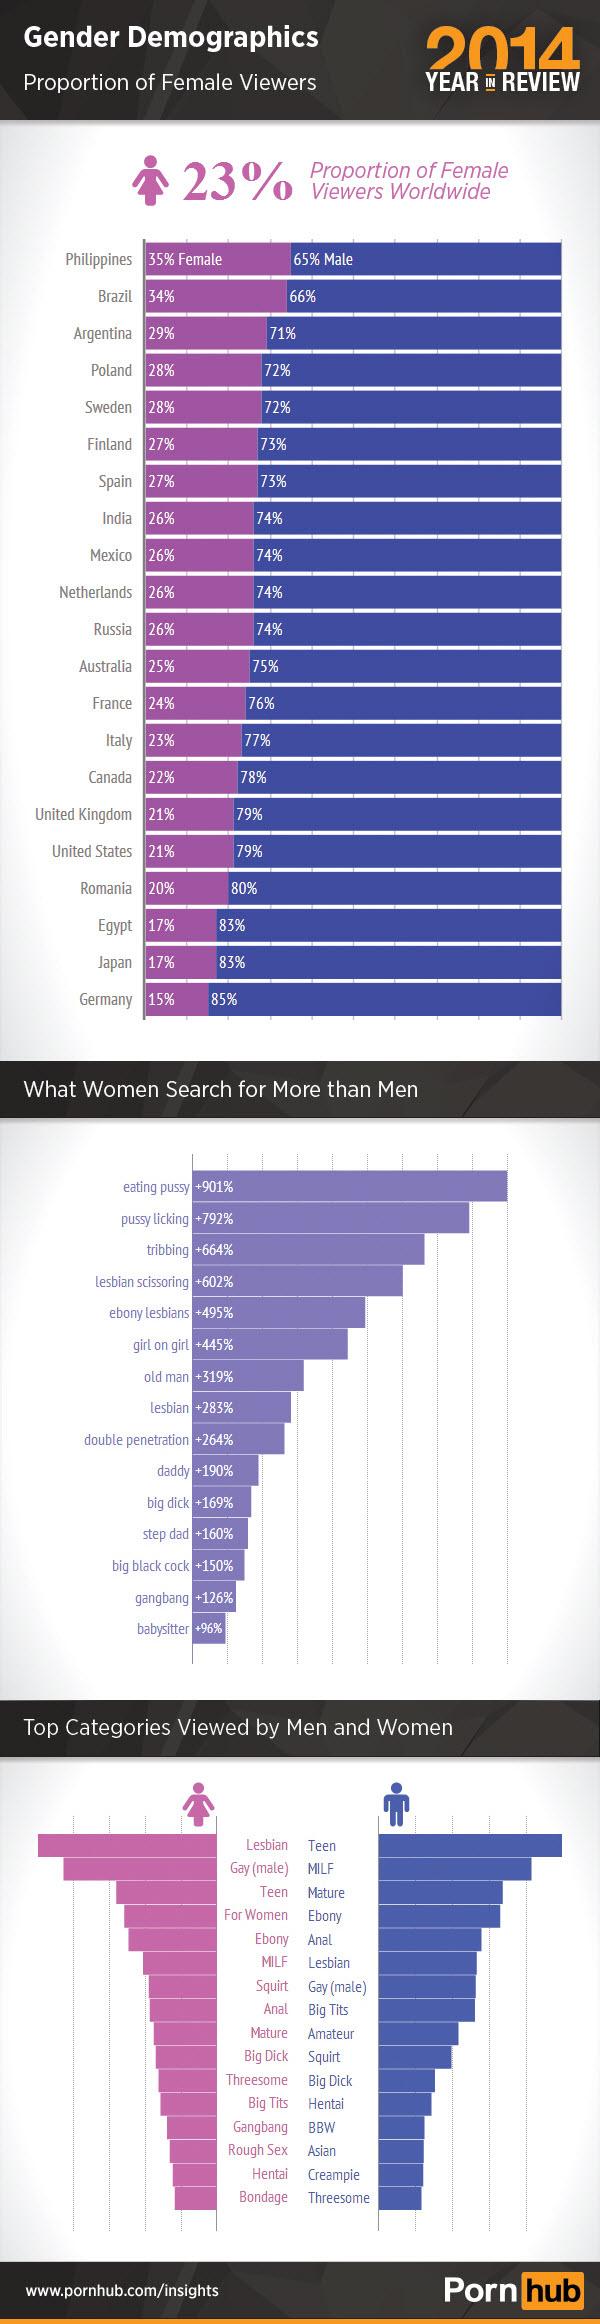 3-pornhub-2014-gender-demographics